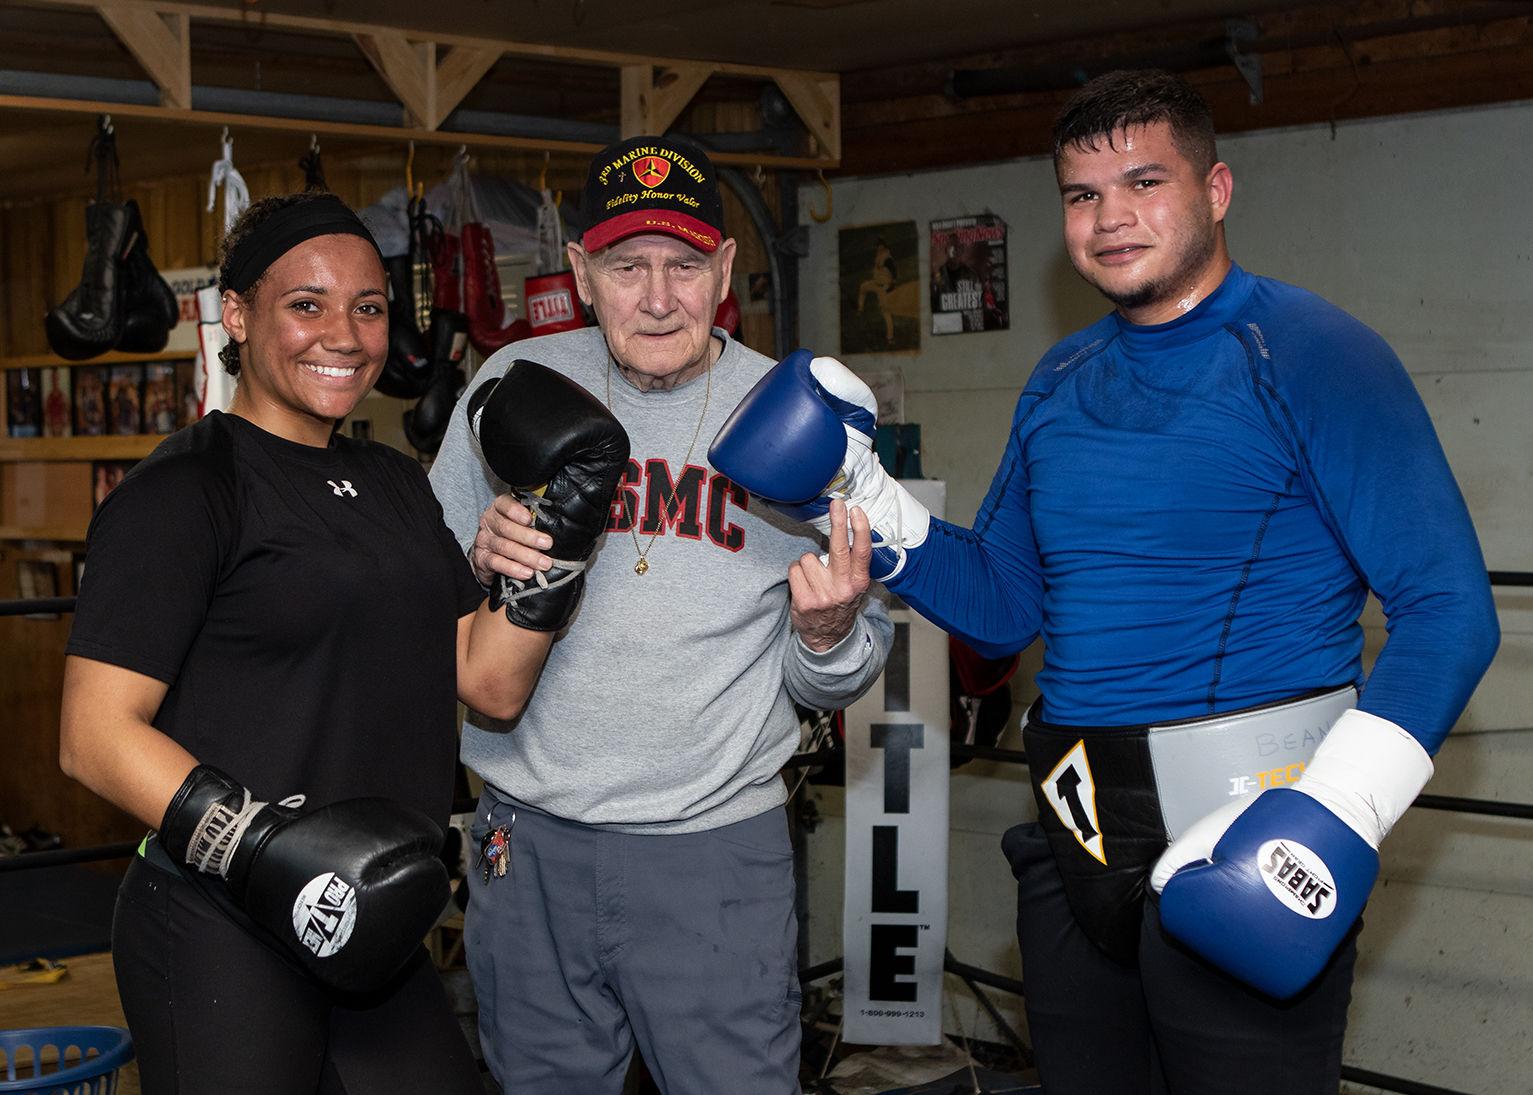 Illinois amateur boxing